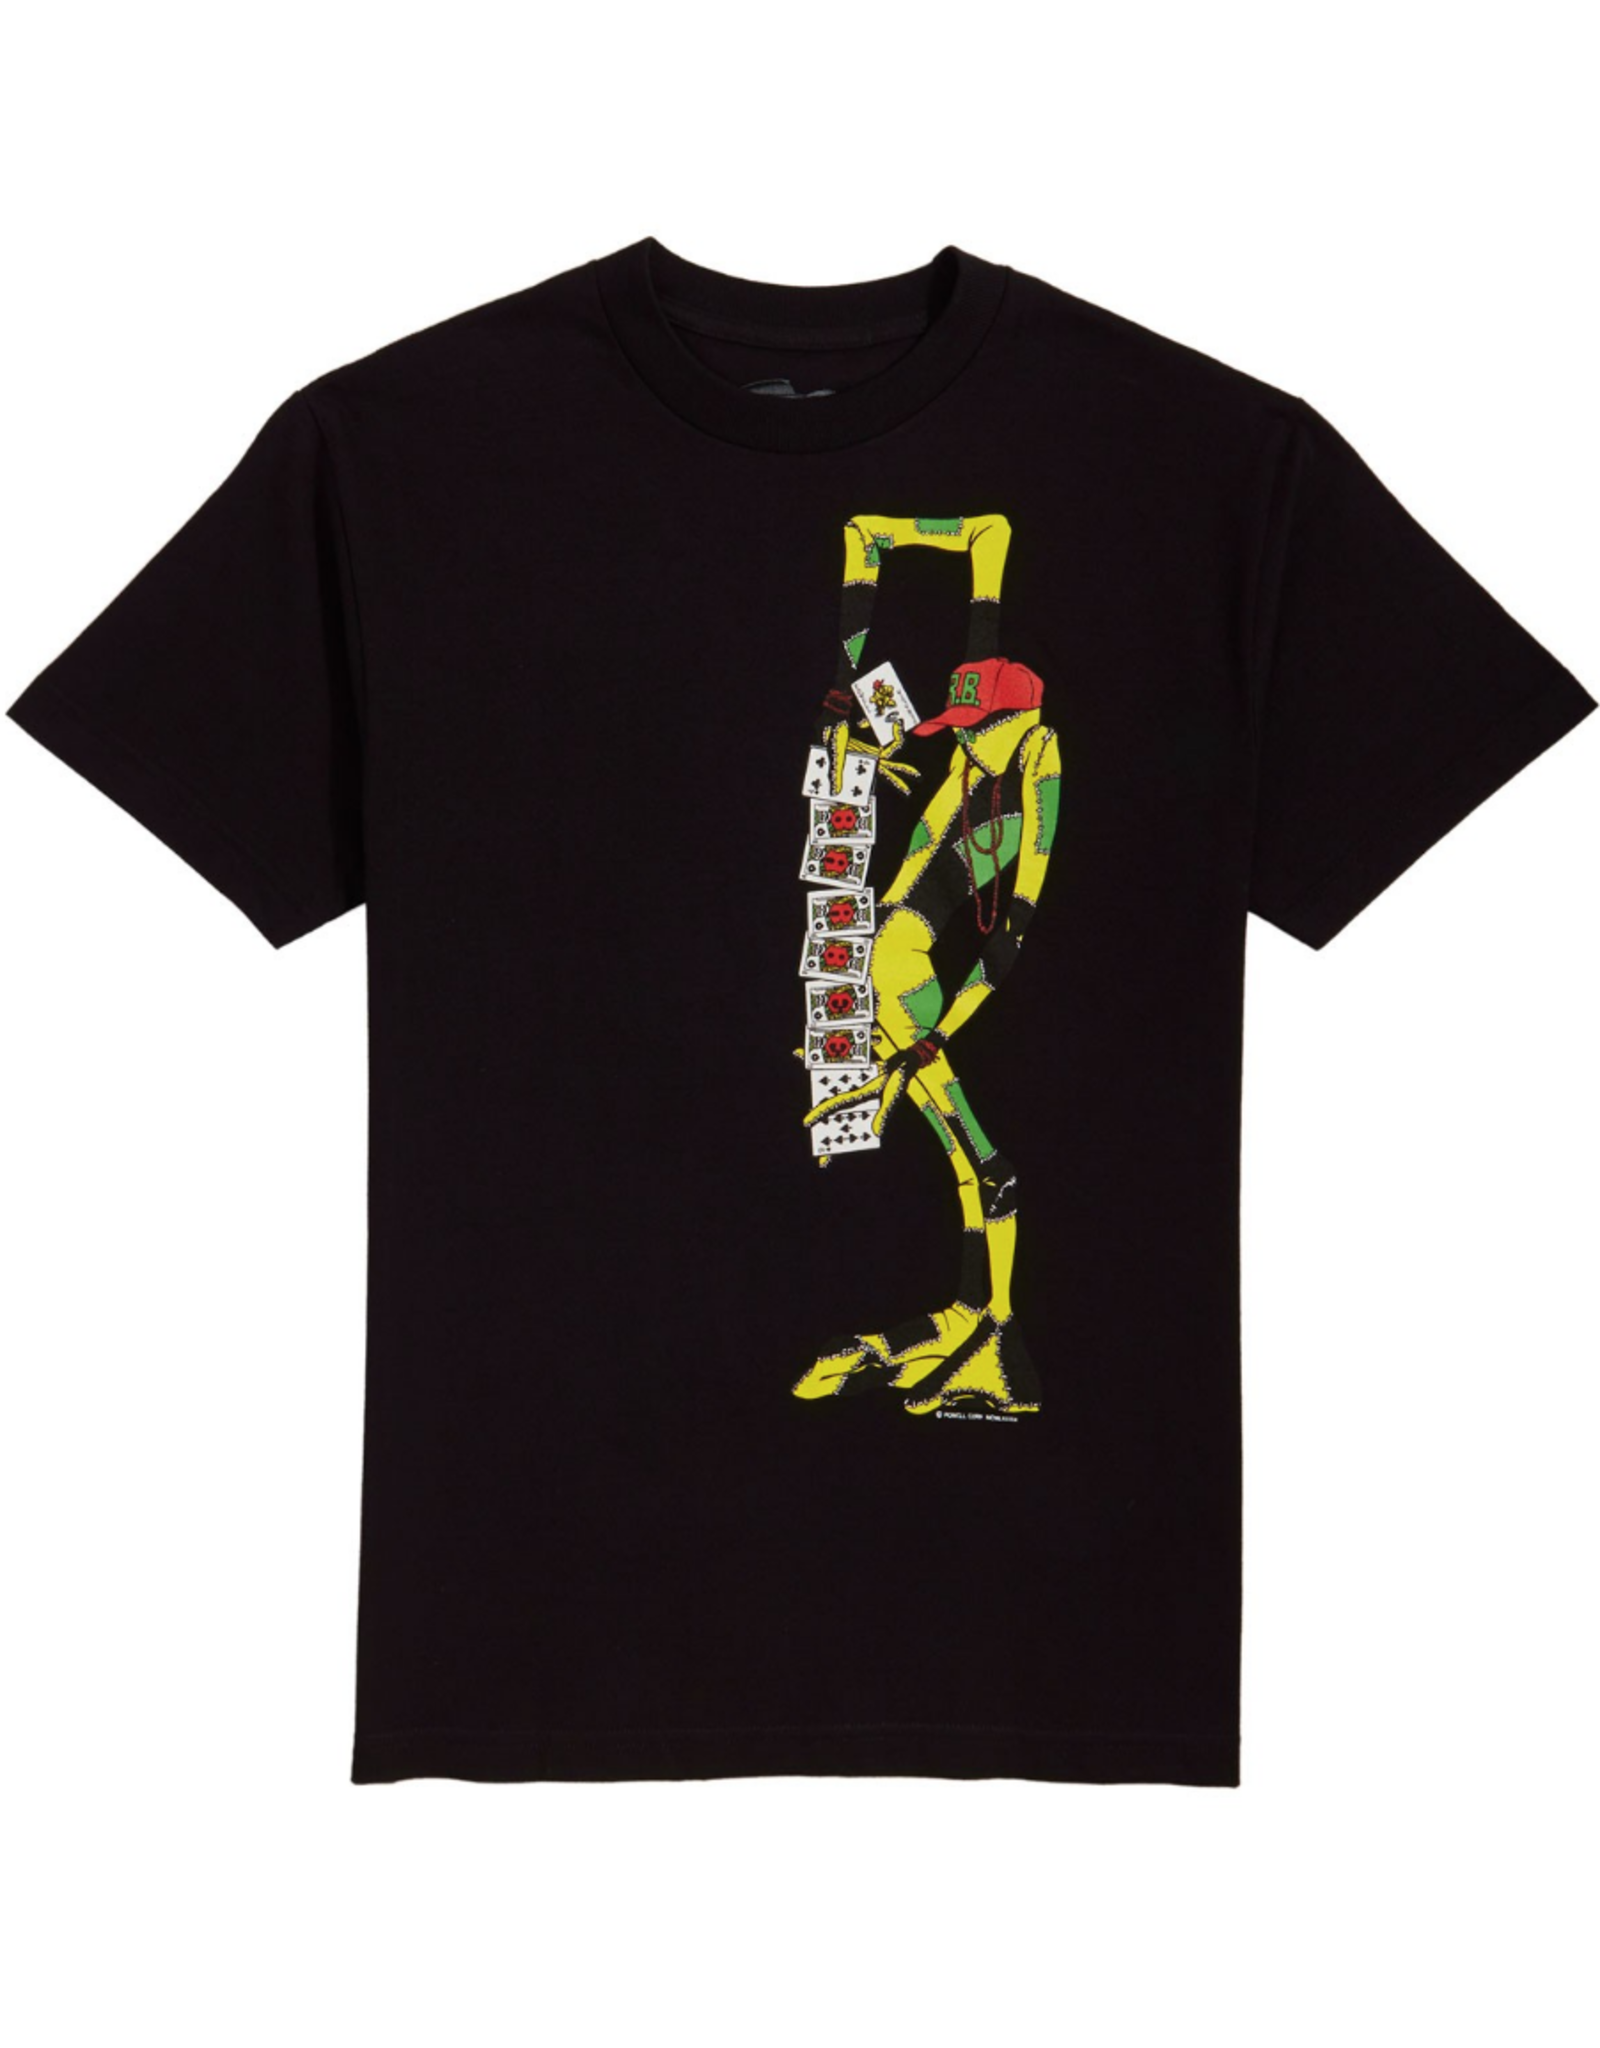 Powell Peralta Ray Barbee Ragdoll T-Shirt - Black